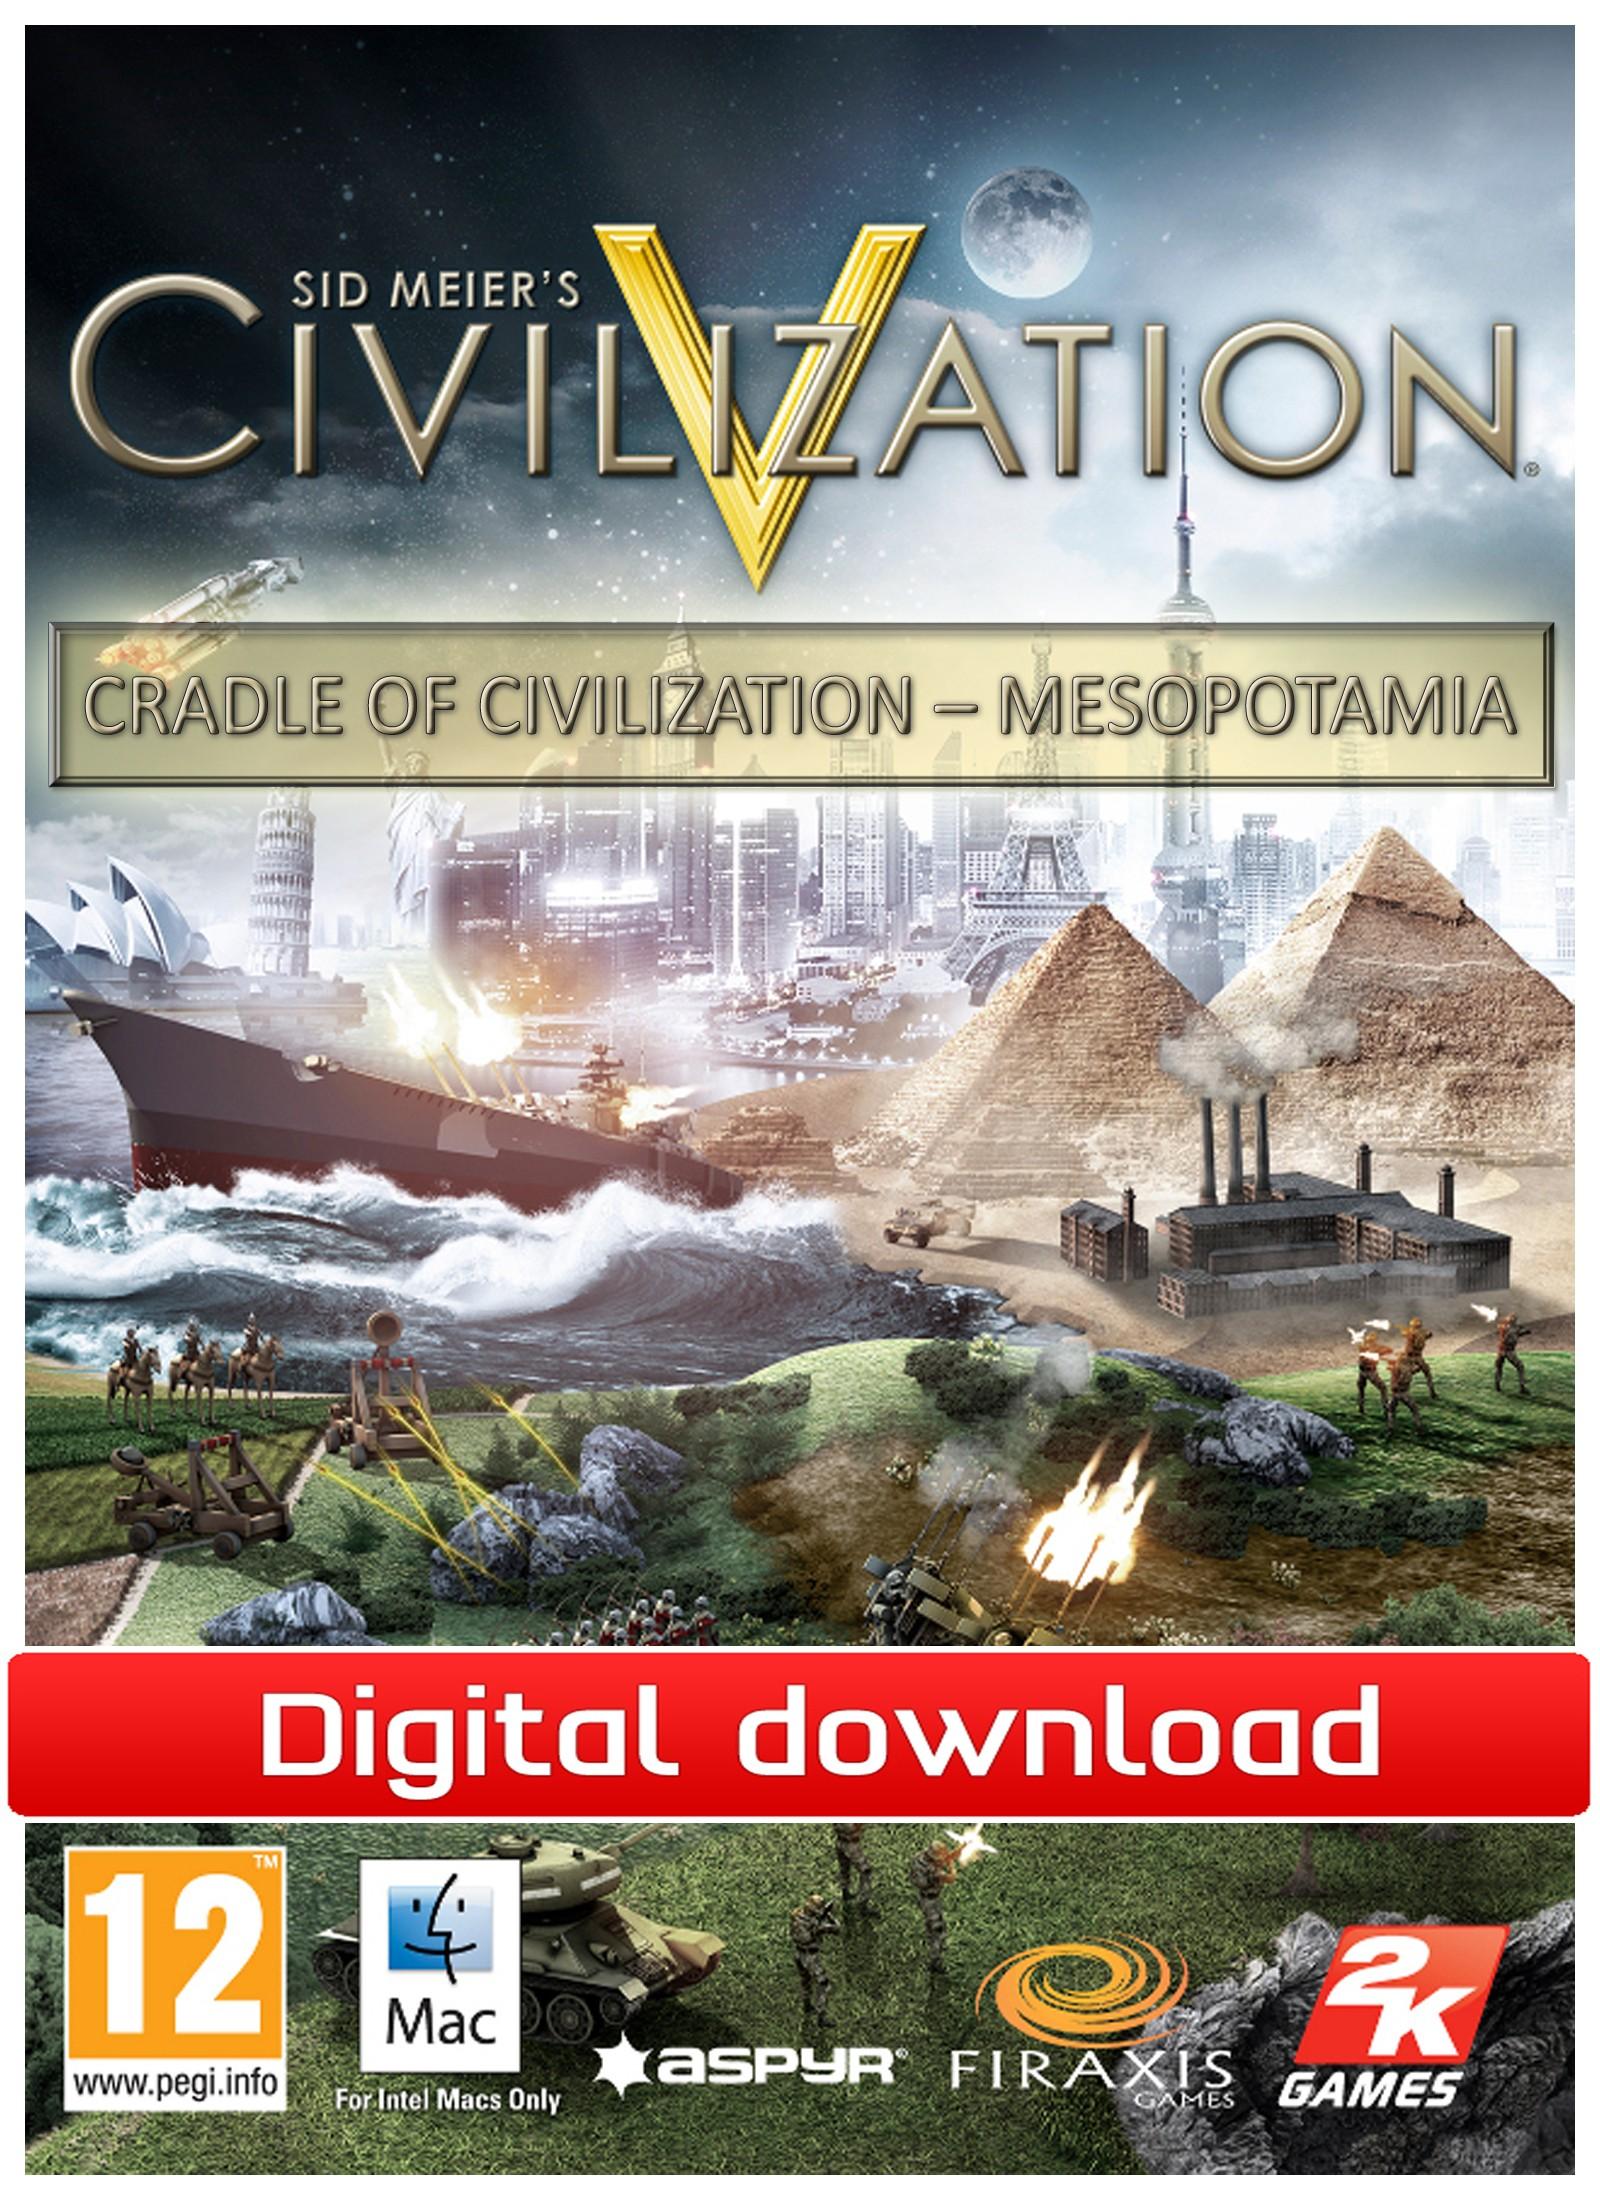 Civilization 5: CoC - Mesopotamia (Mac nedlastning) PCDD29166